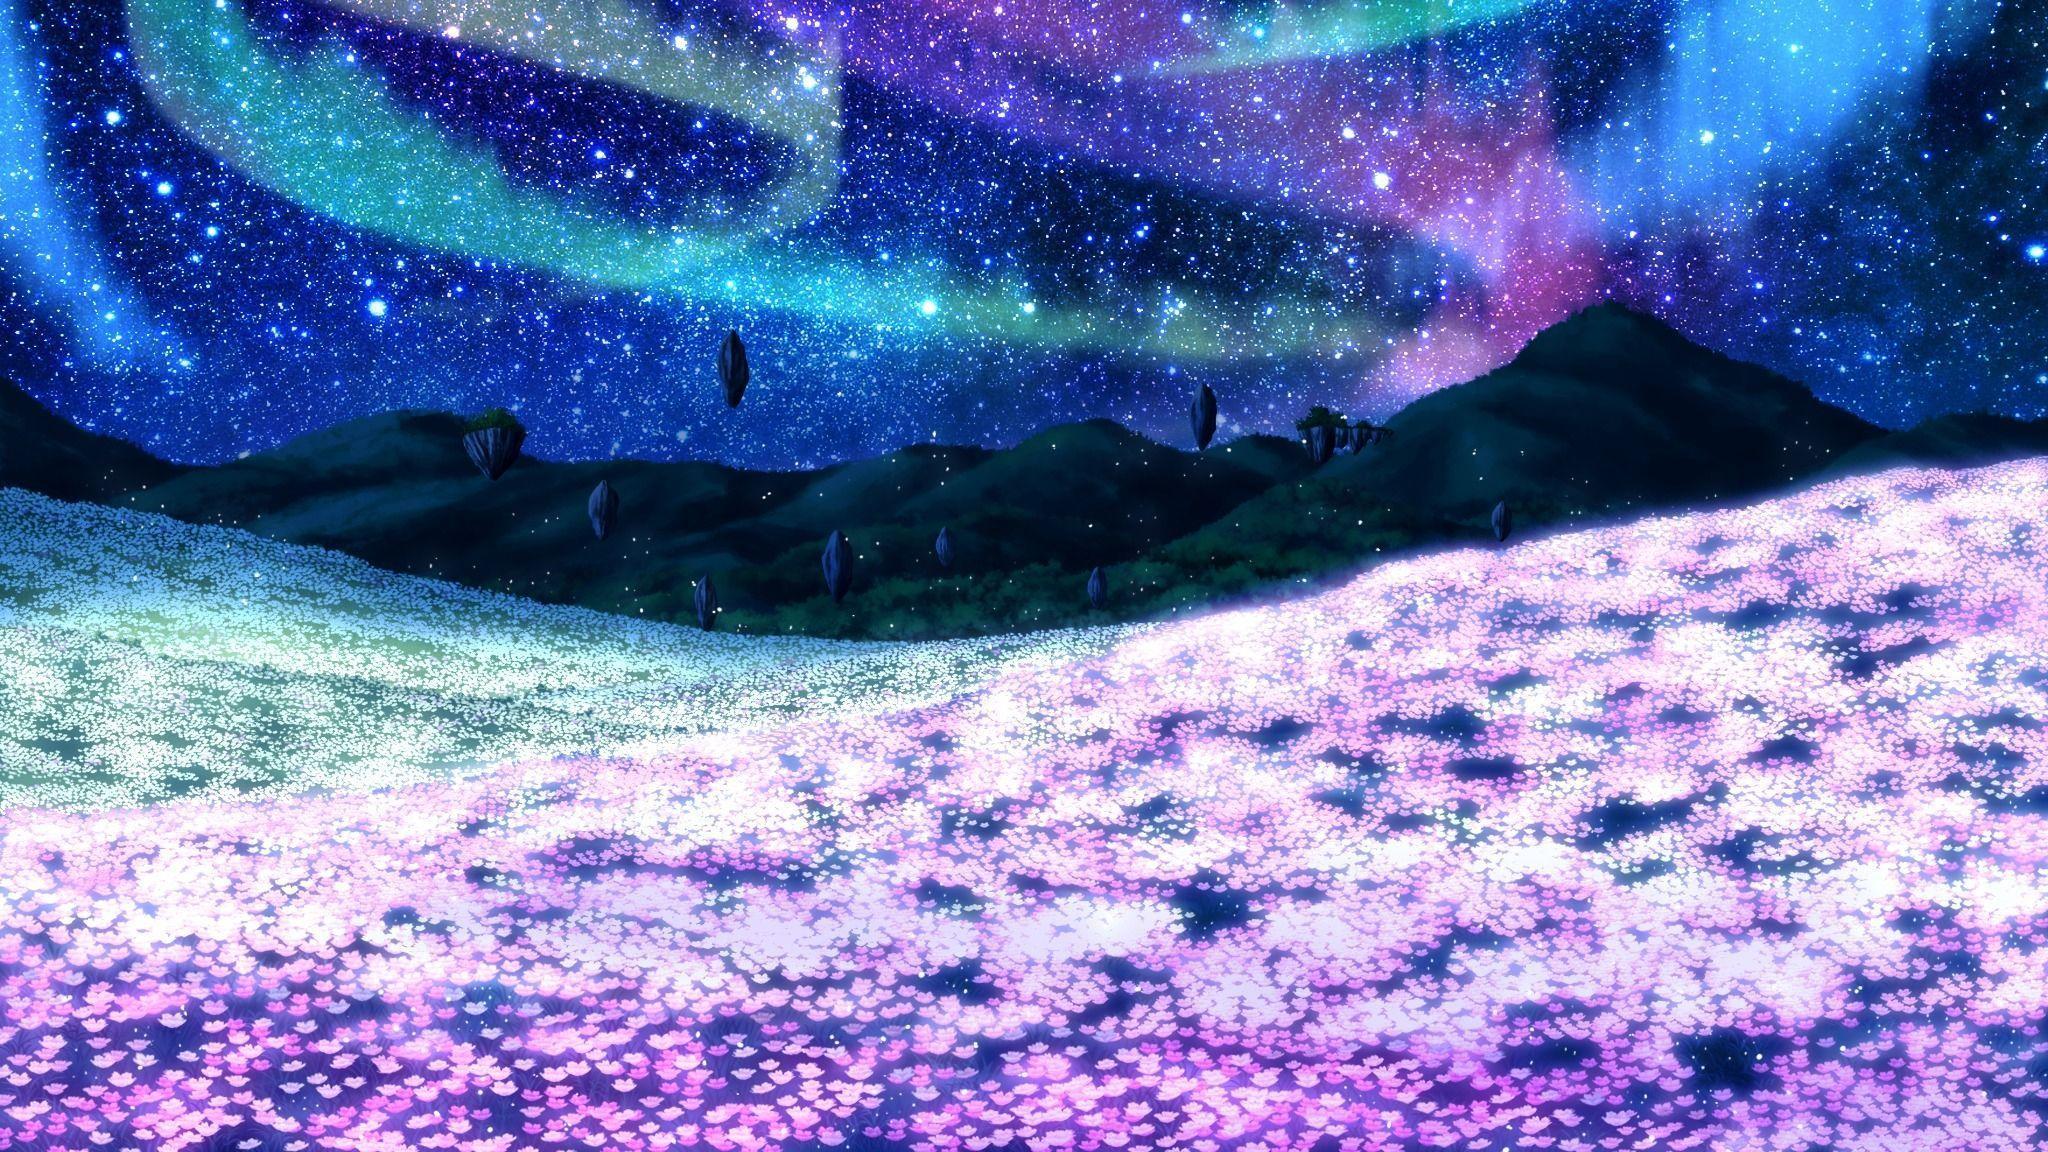 2048x1152 Aesthetic Sky